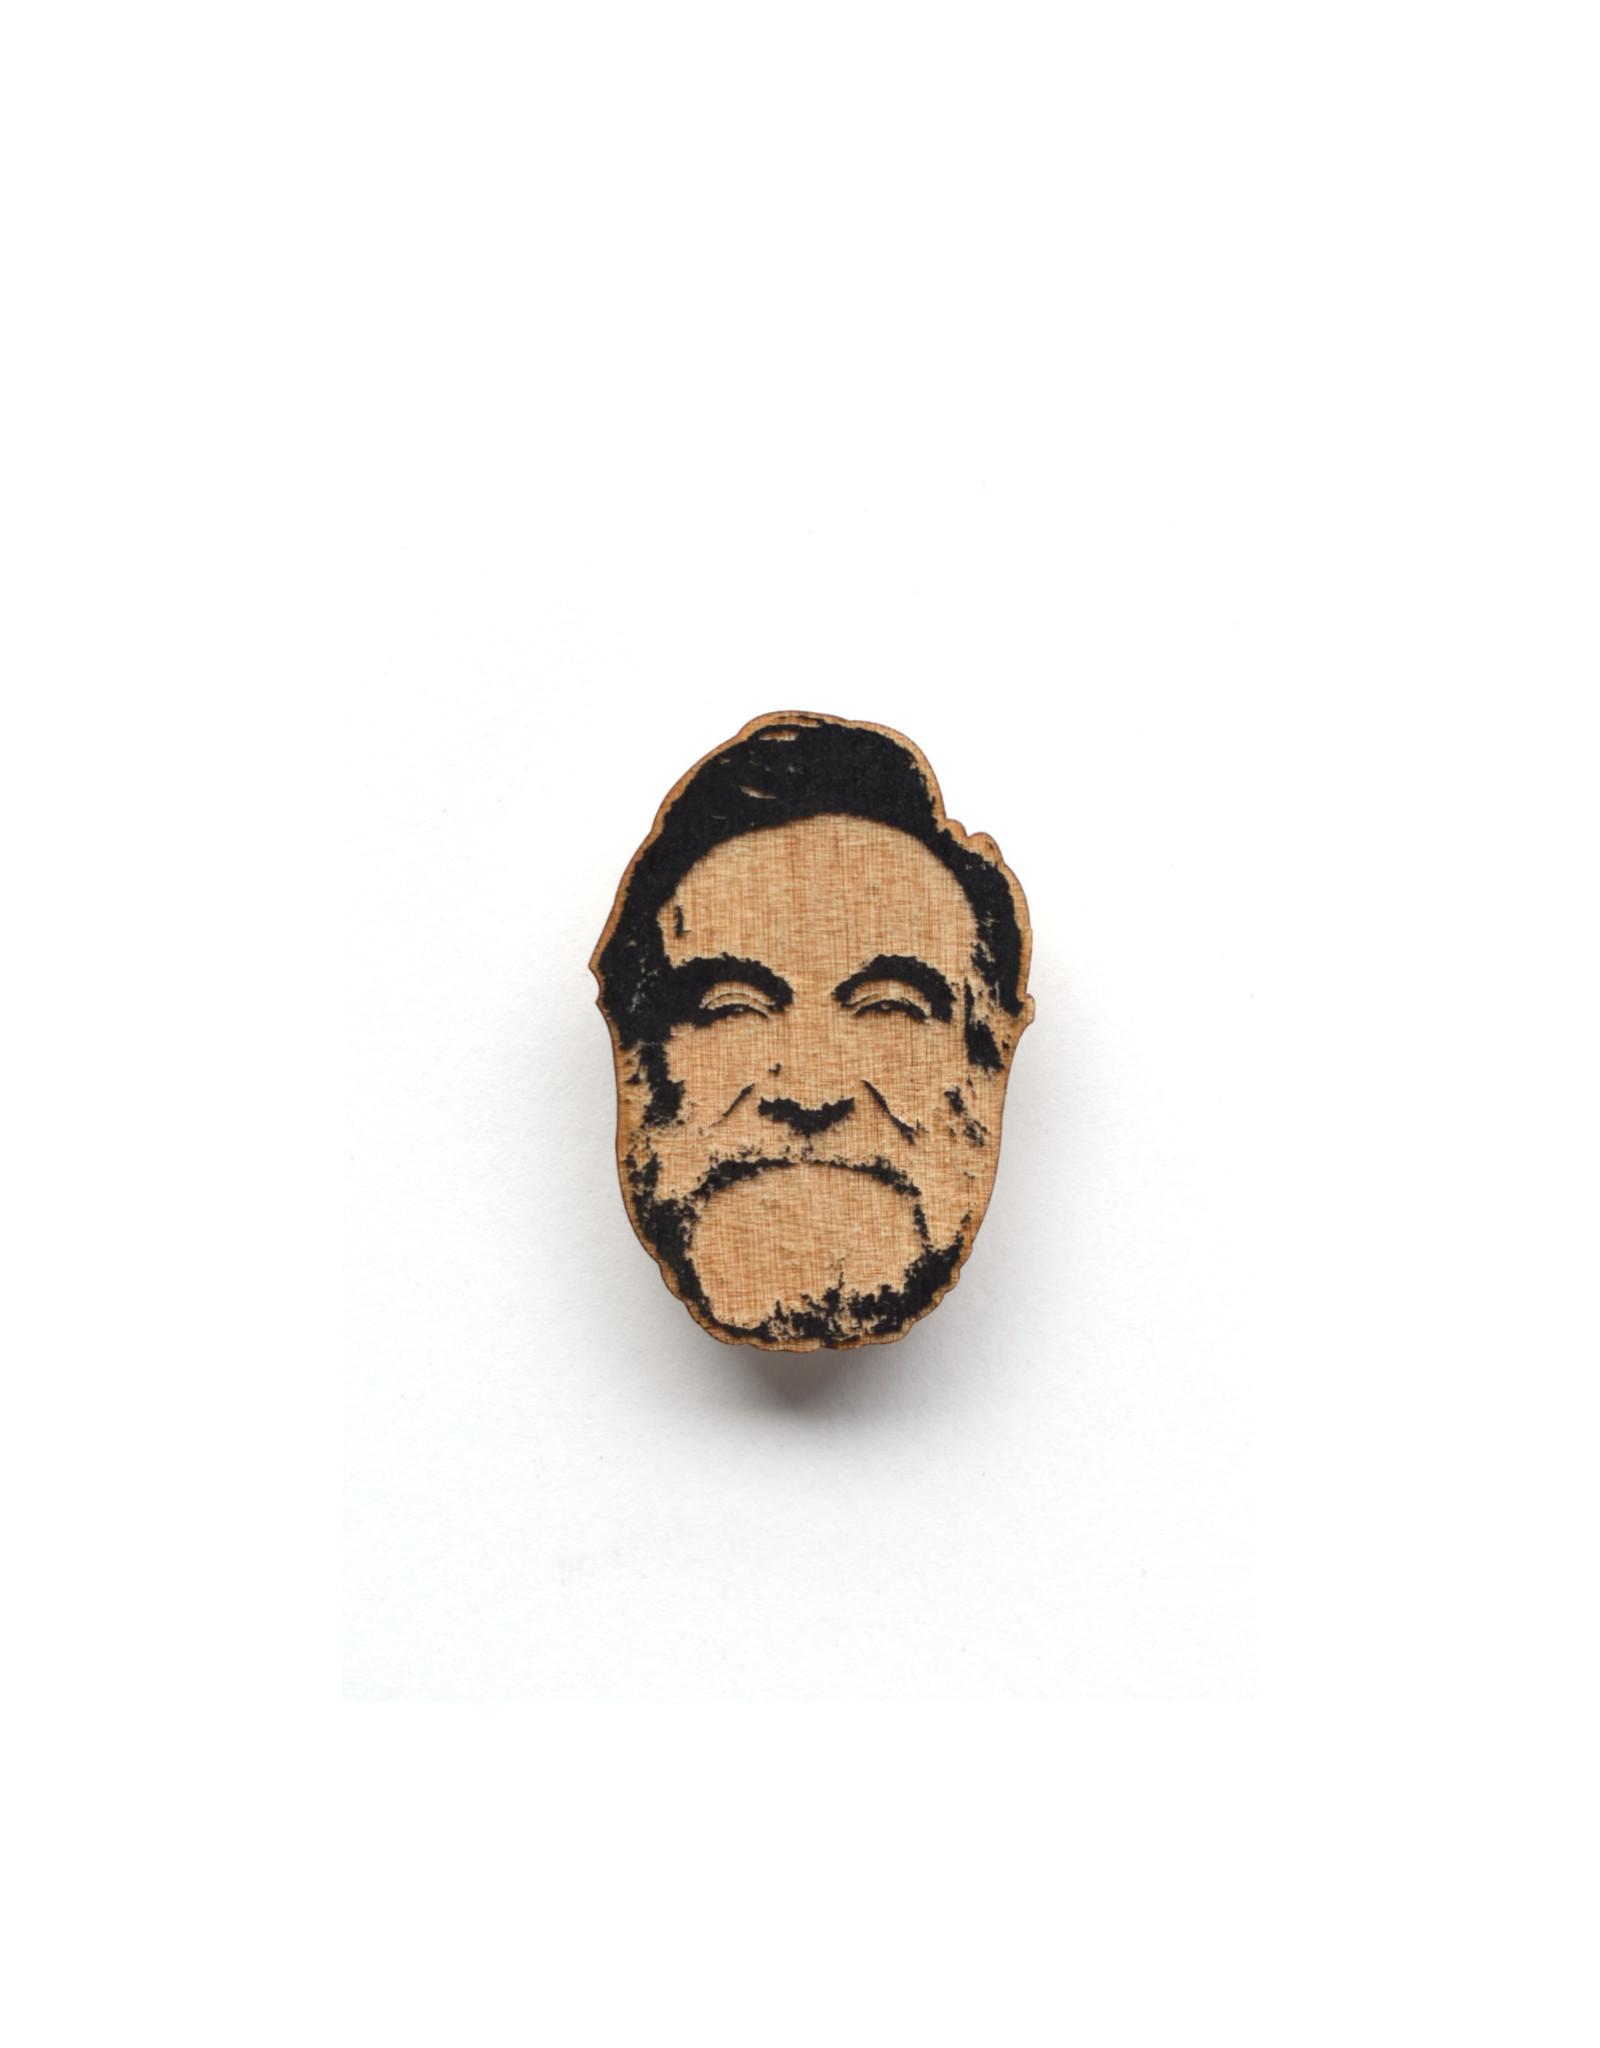 Robin Williams Wooden Pin